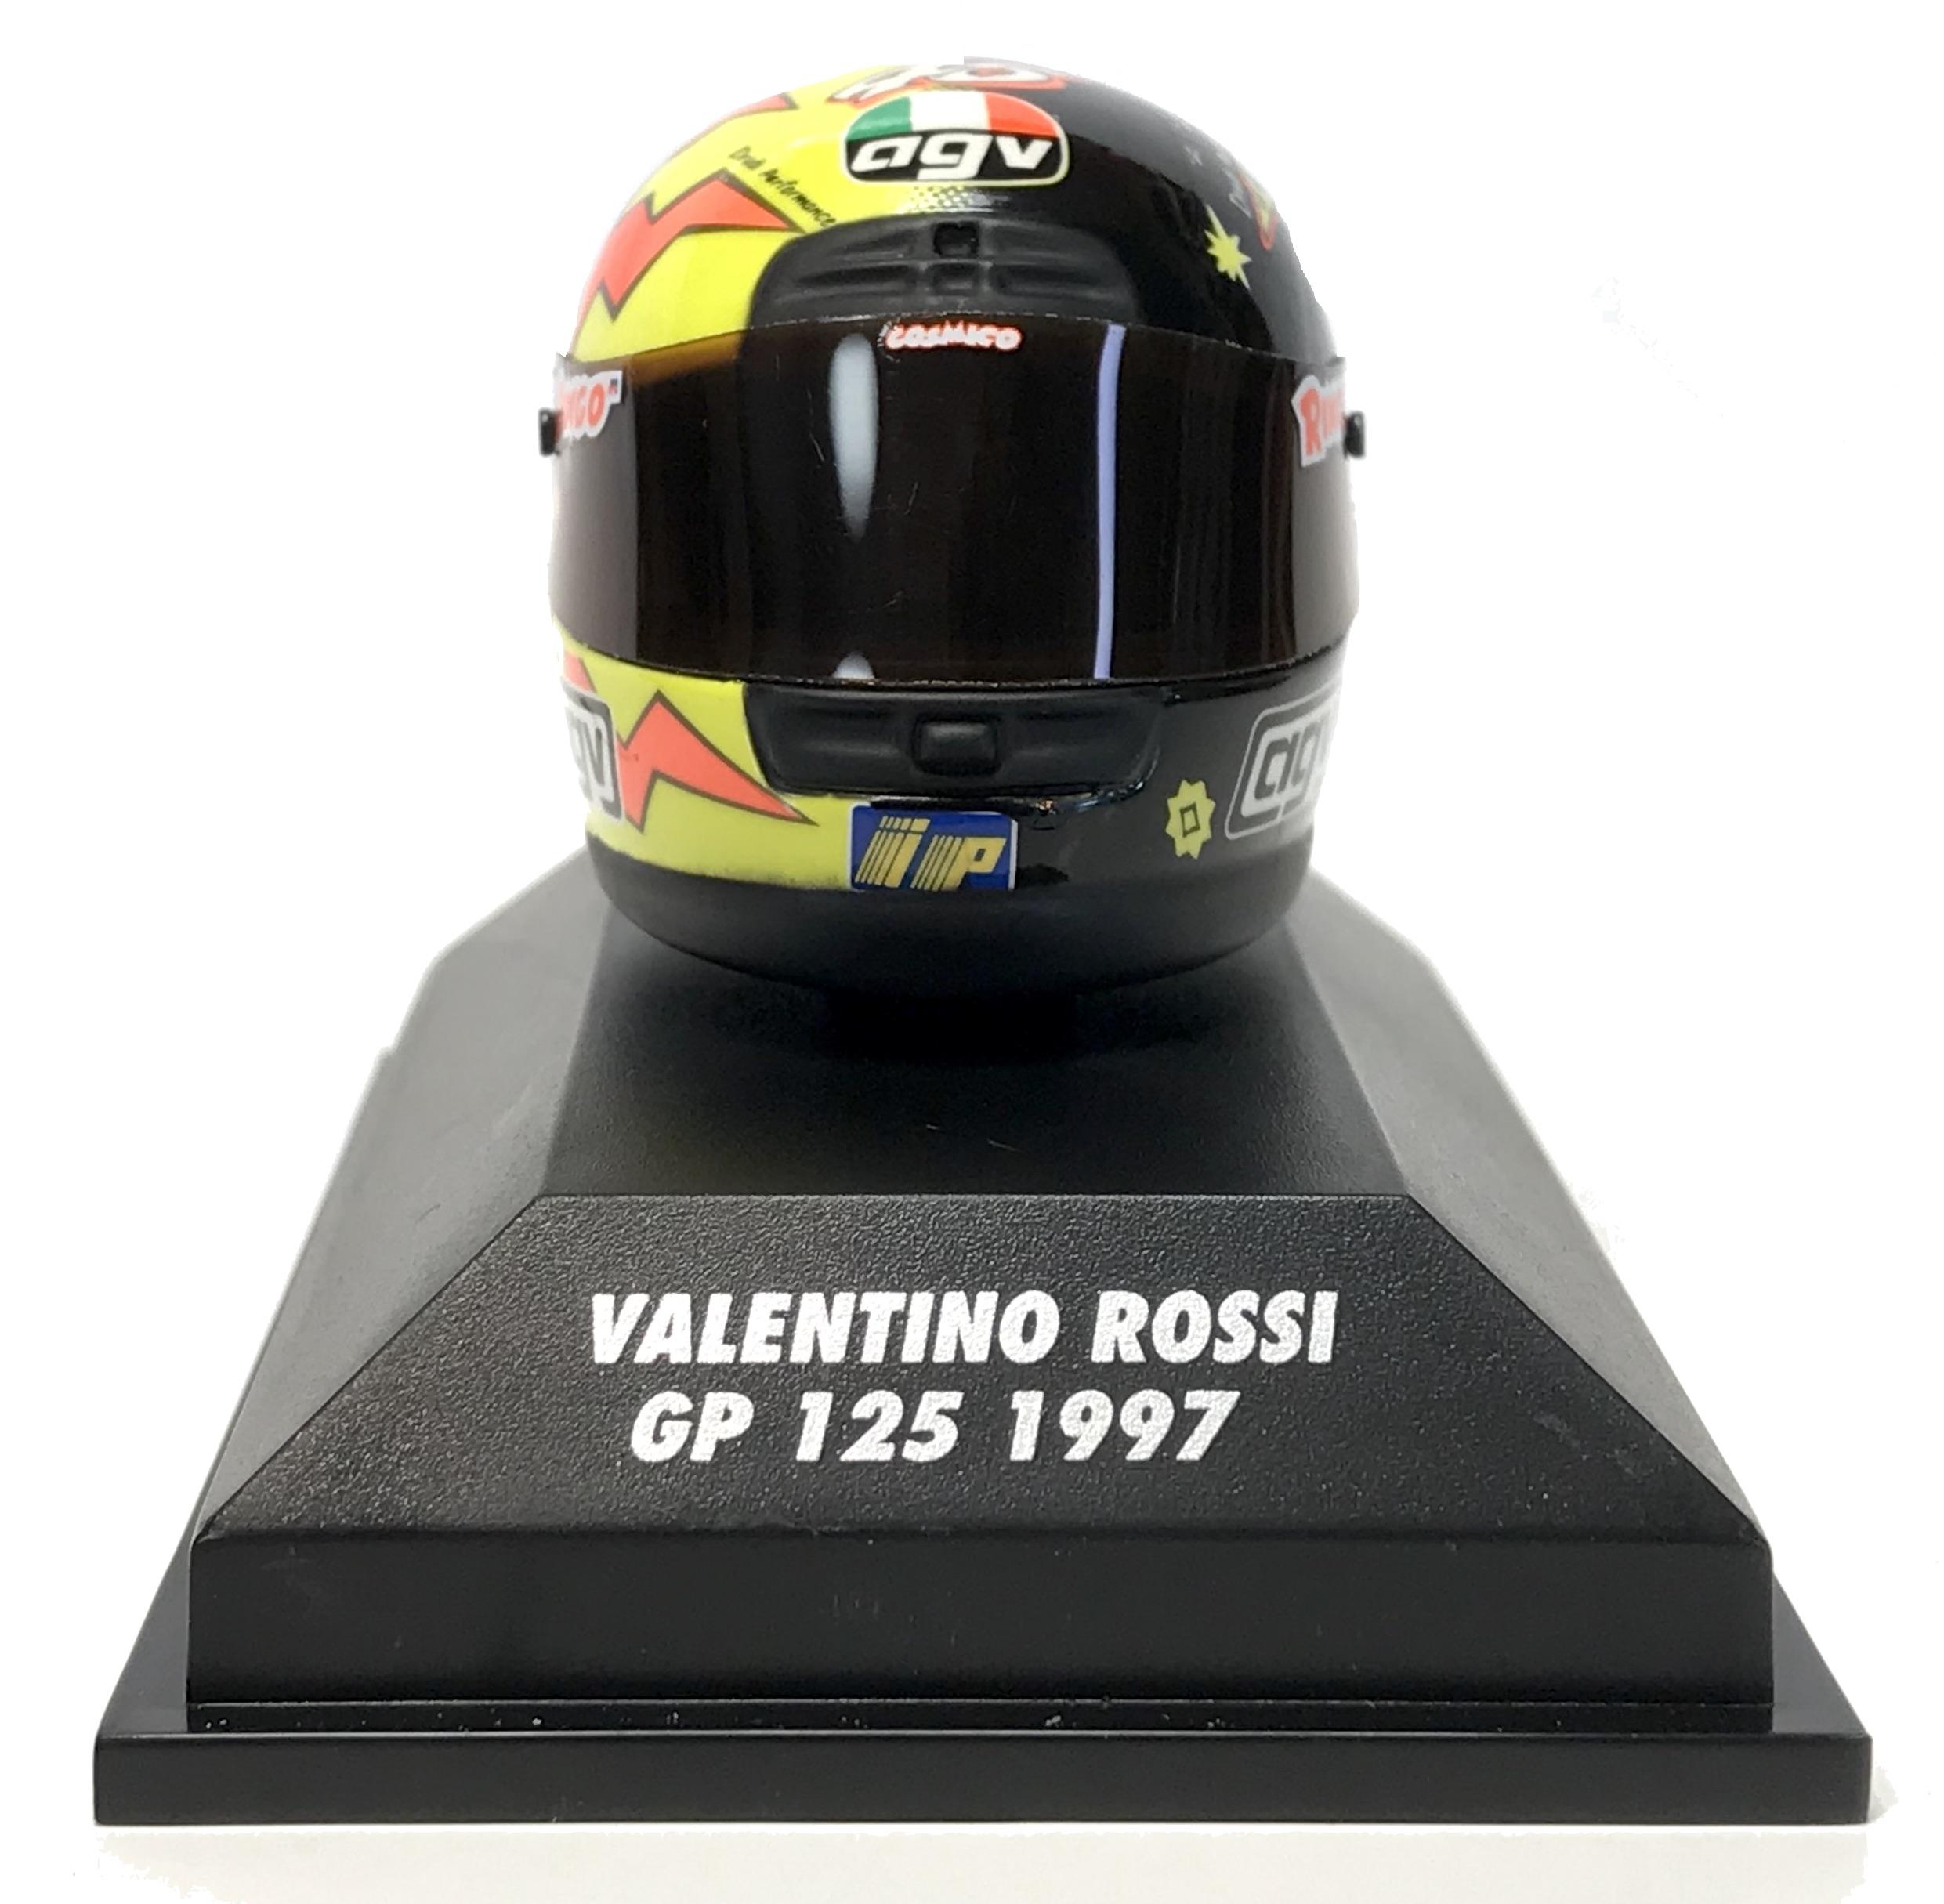 Valentino Rossi GP 125 1997 Helmet 1/8